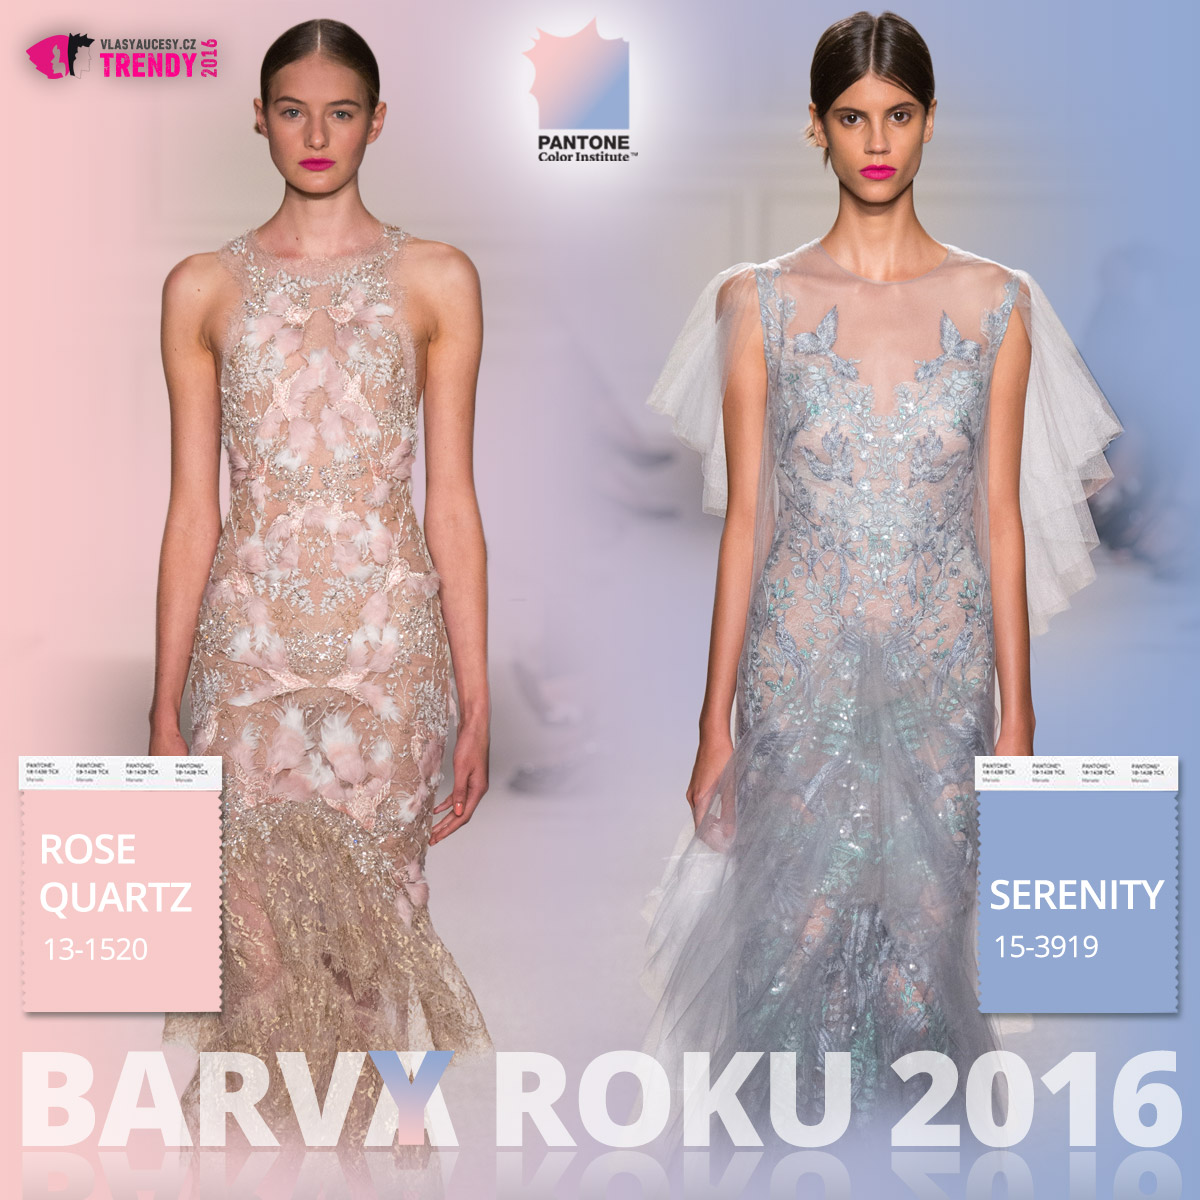 Barvy roku 2016 a móda Marchesa – kolekce jaro/léto 2016.